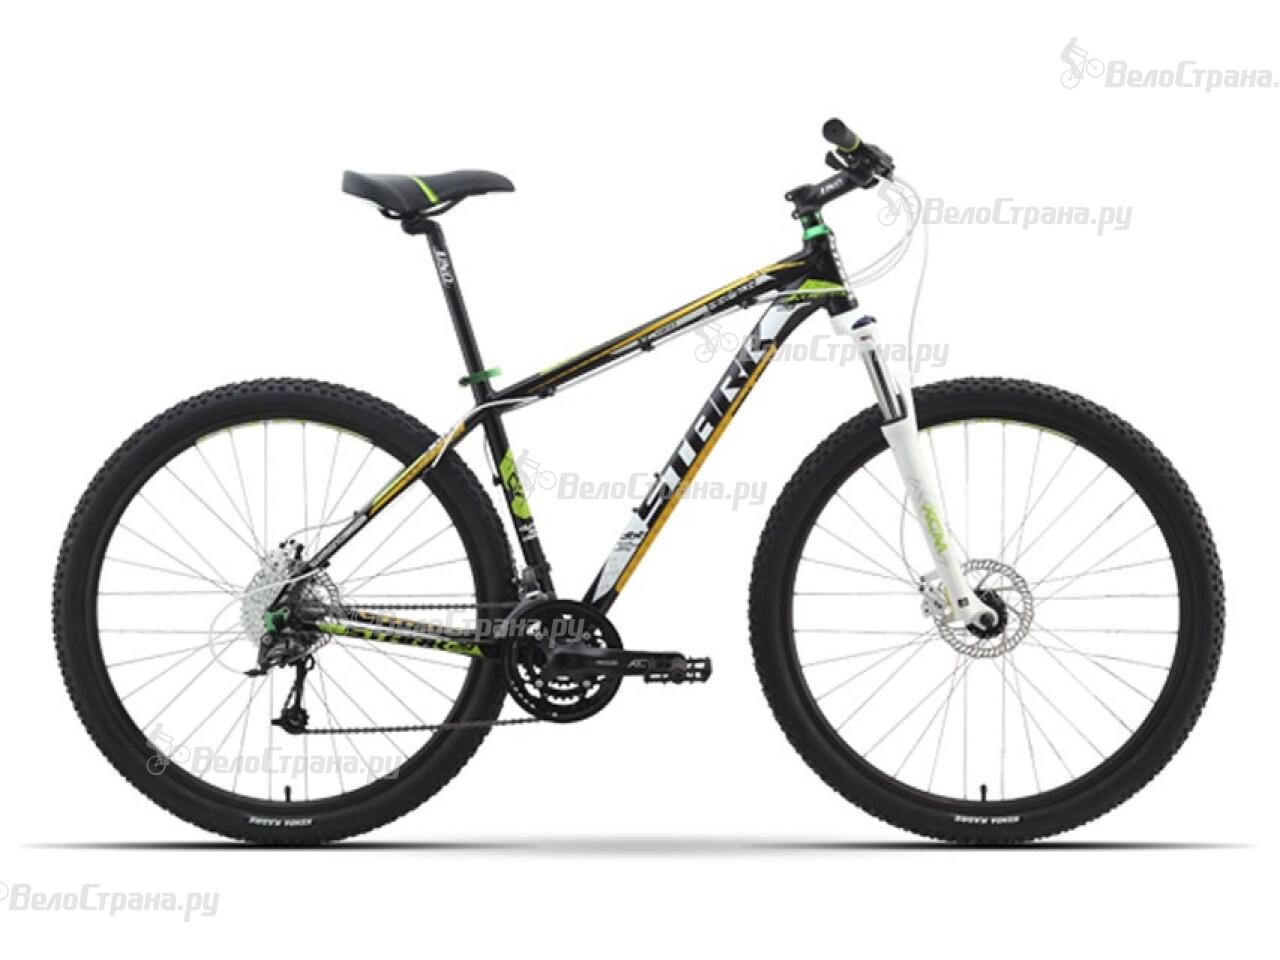 Велосипед Stark Armer 29er HD (2014)